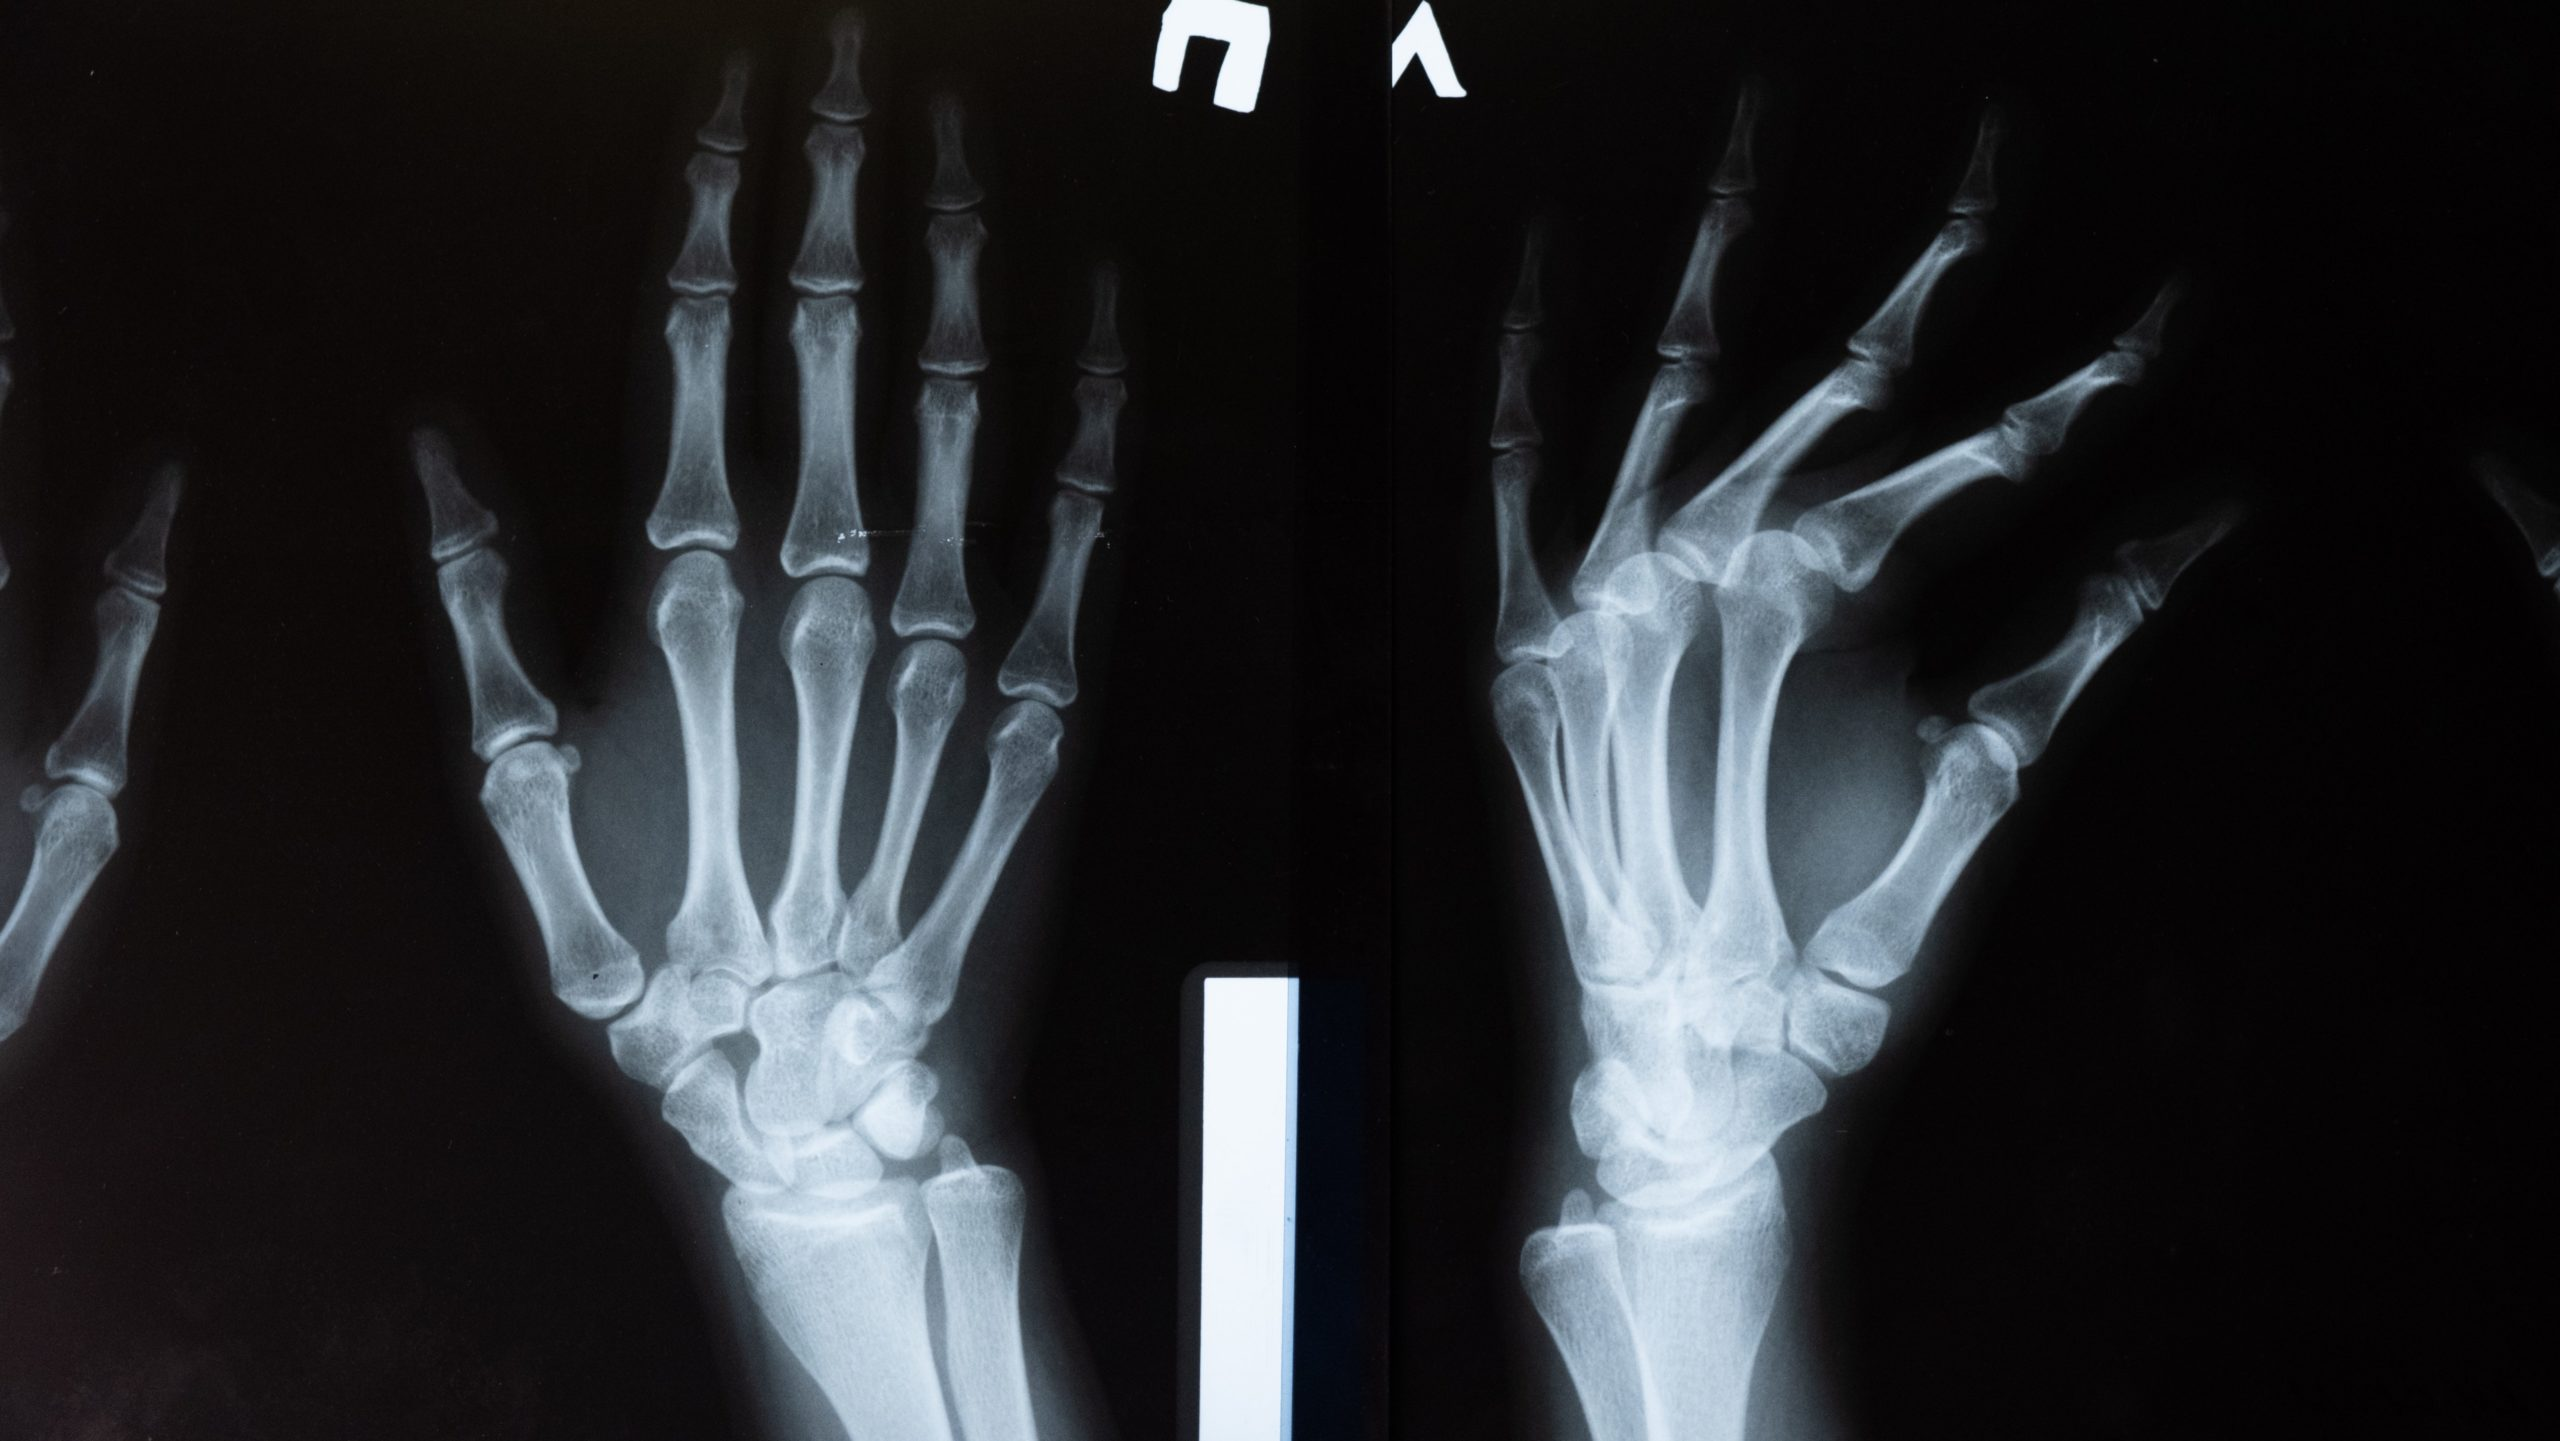 Copper gluconate supports bone health